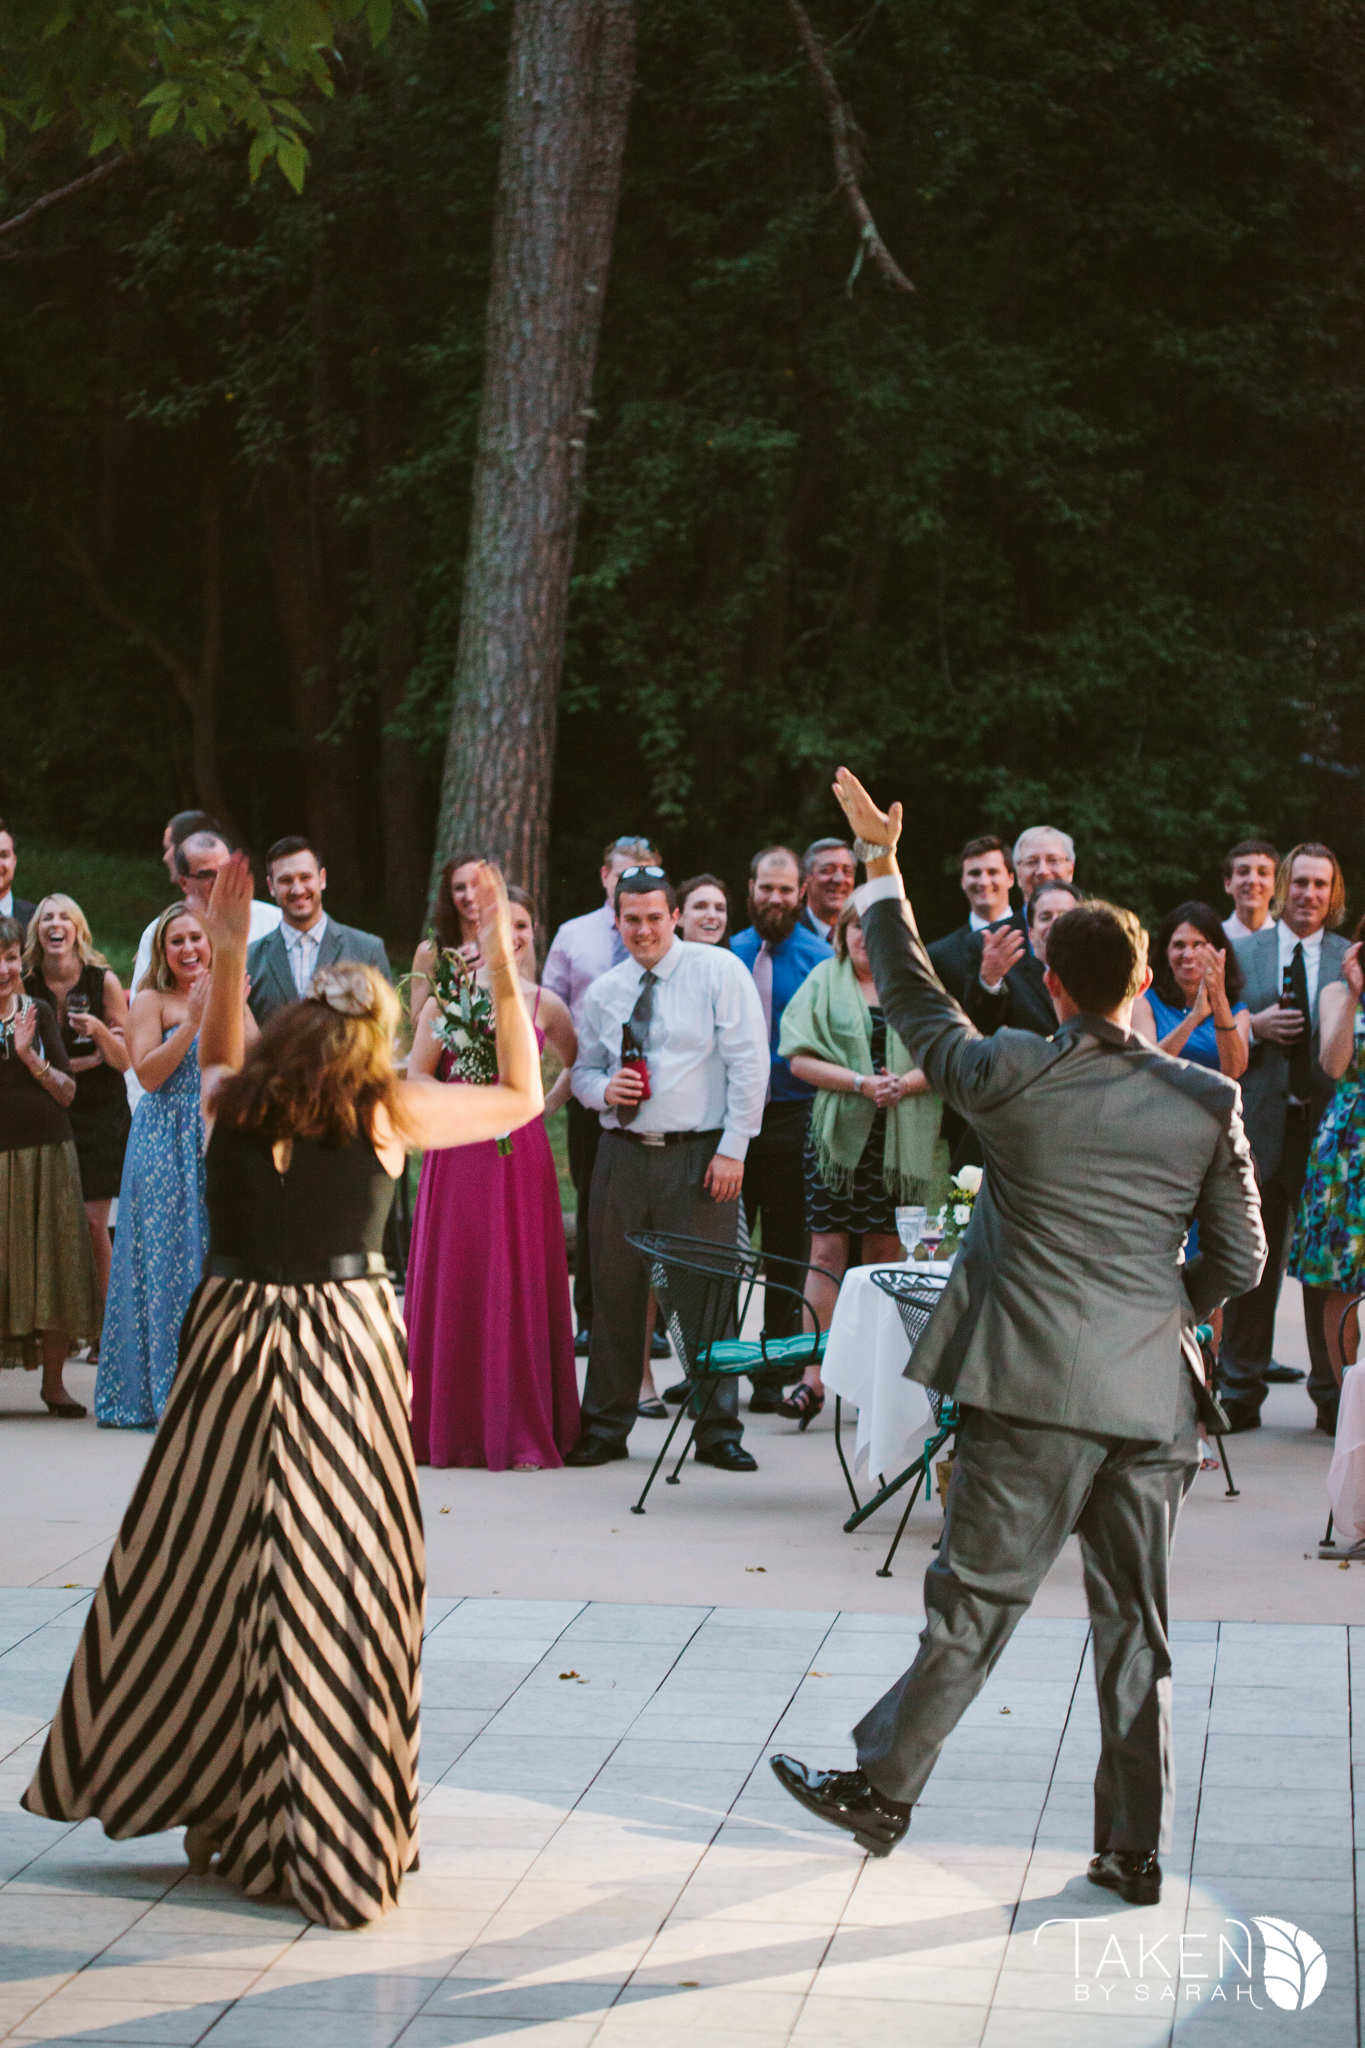 Noise at wedding